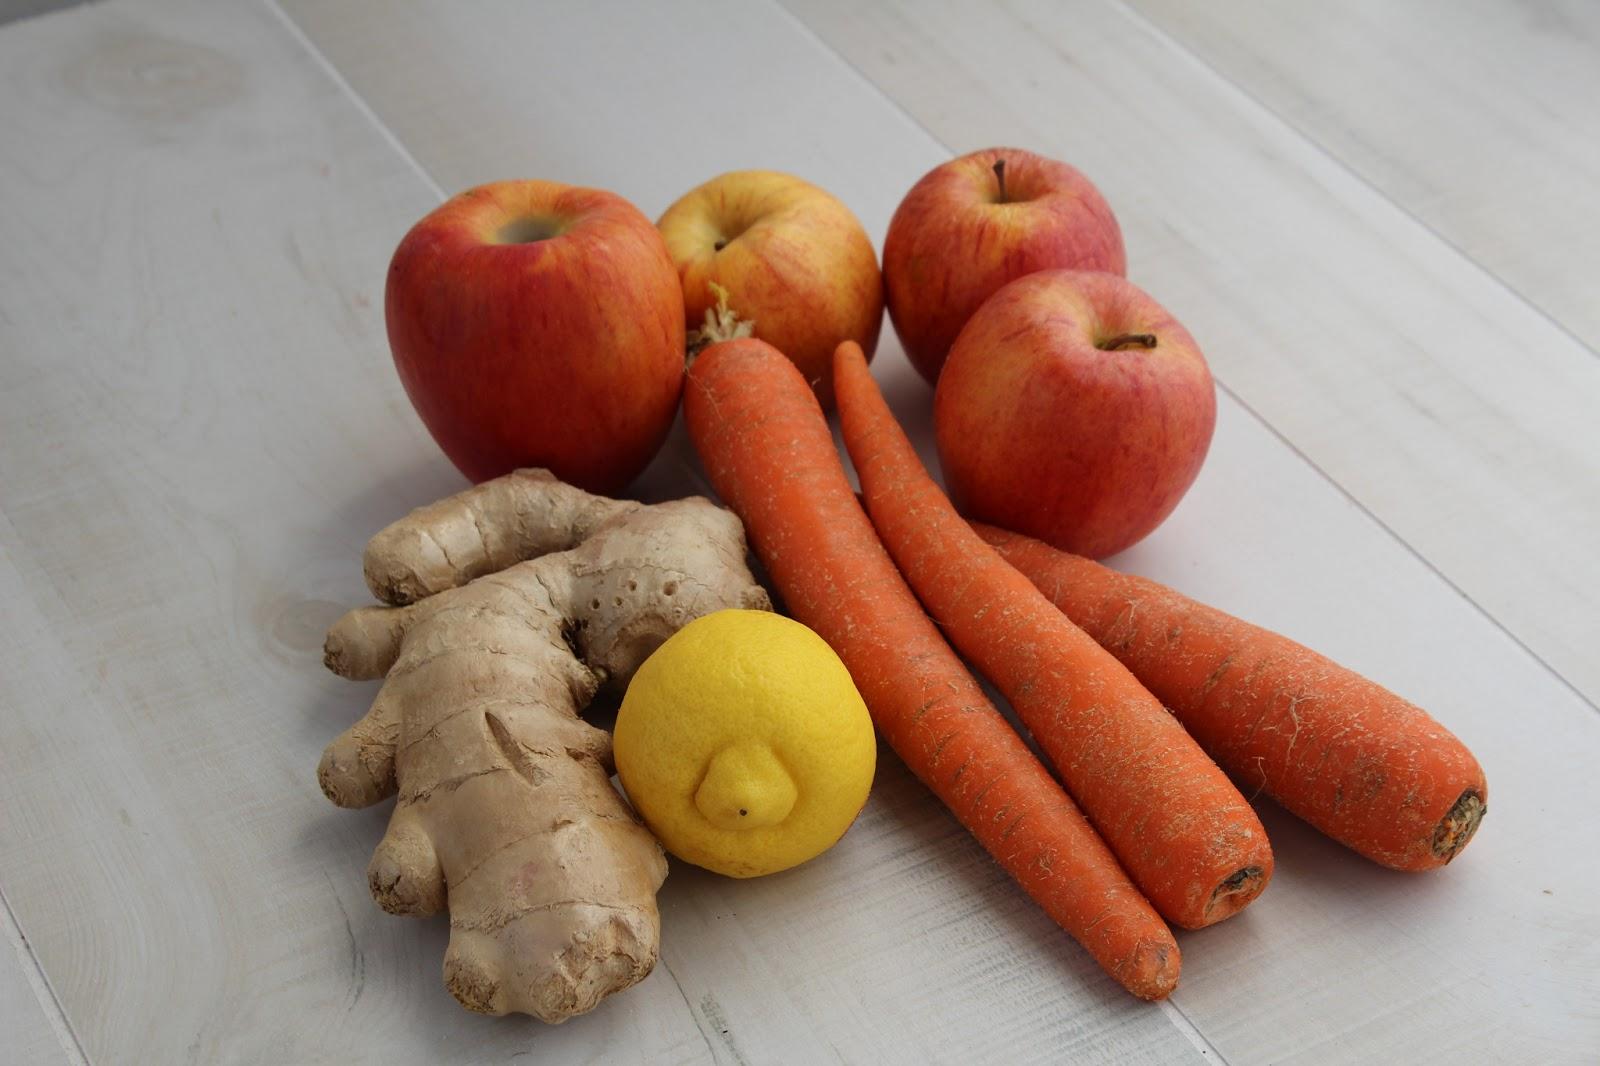 apple juice benefits